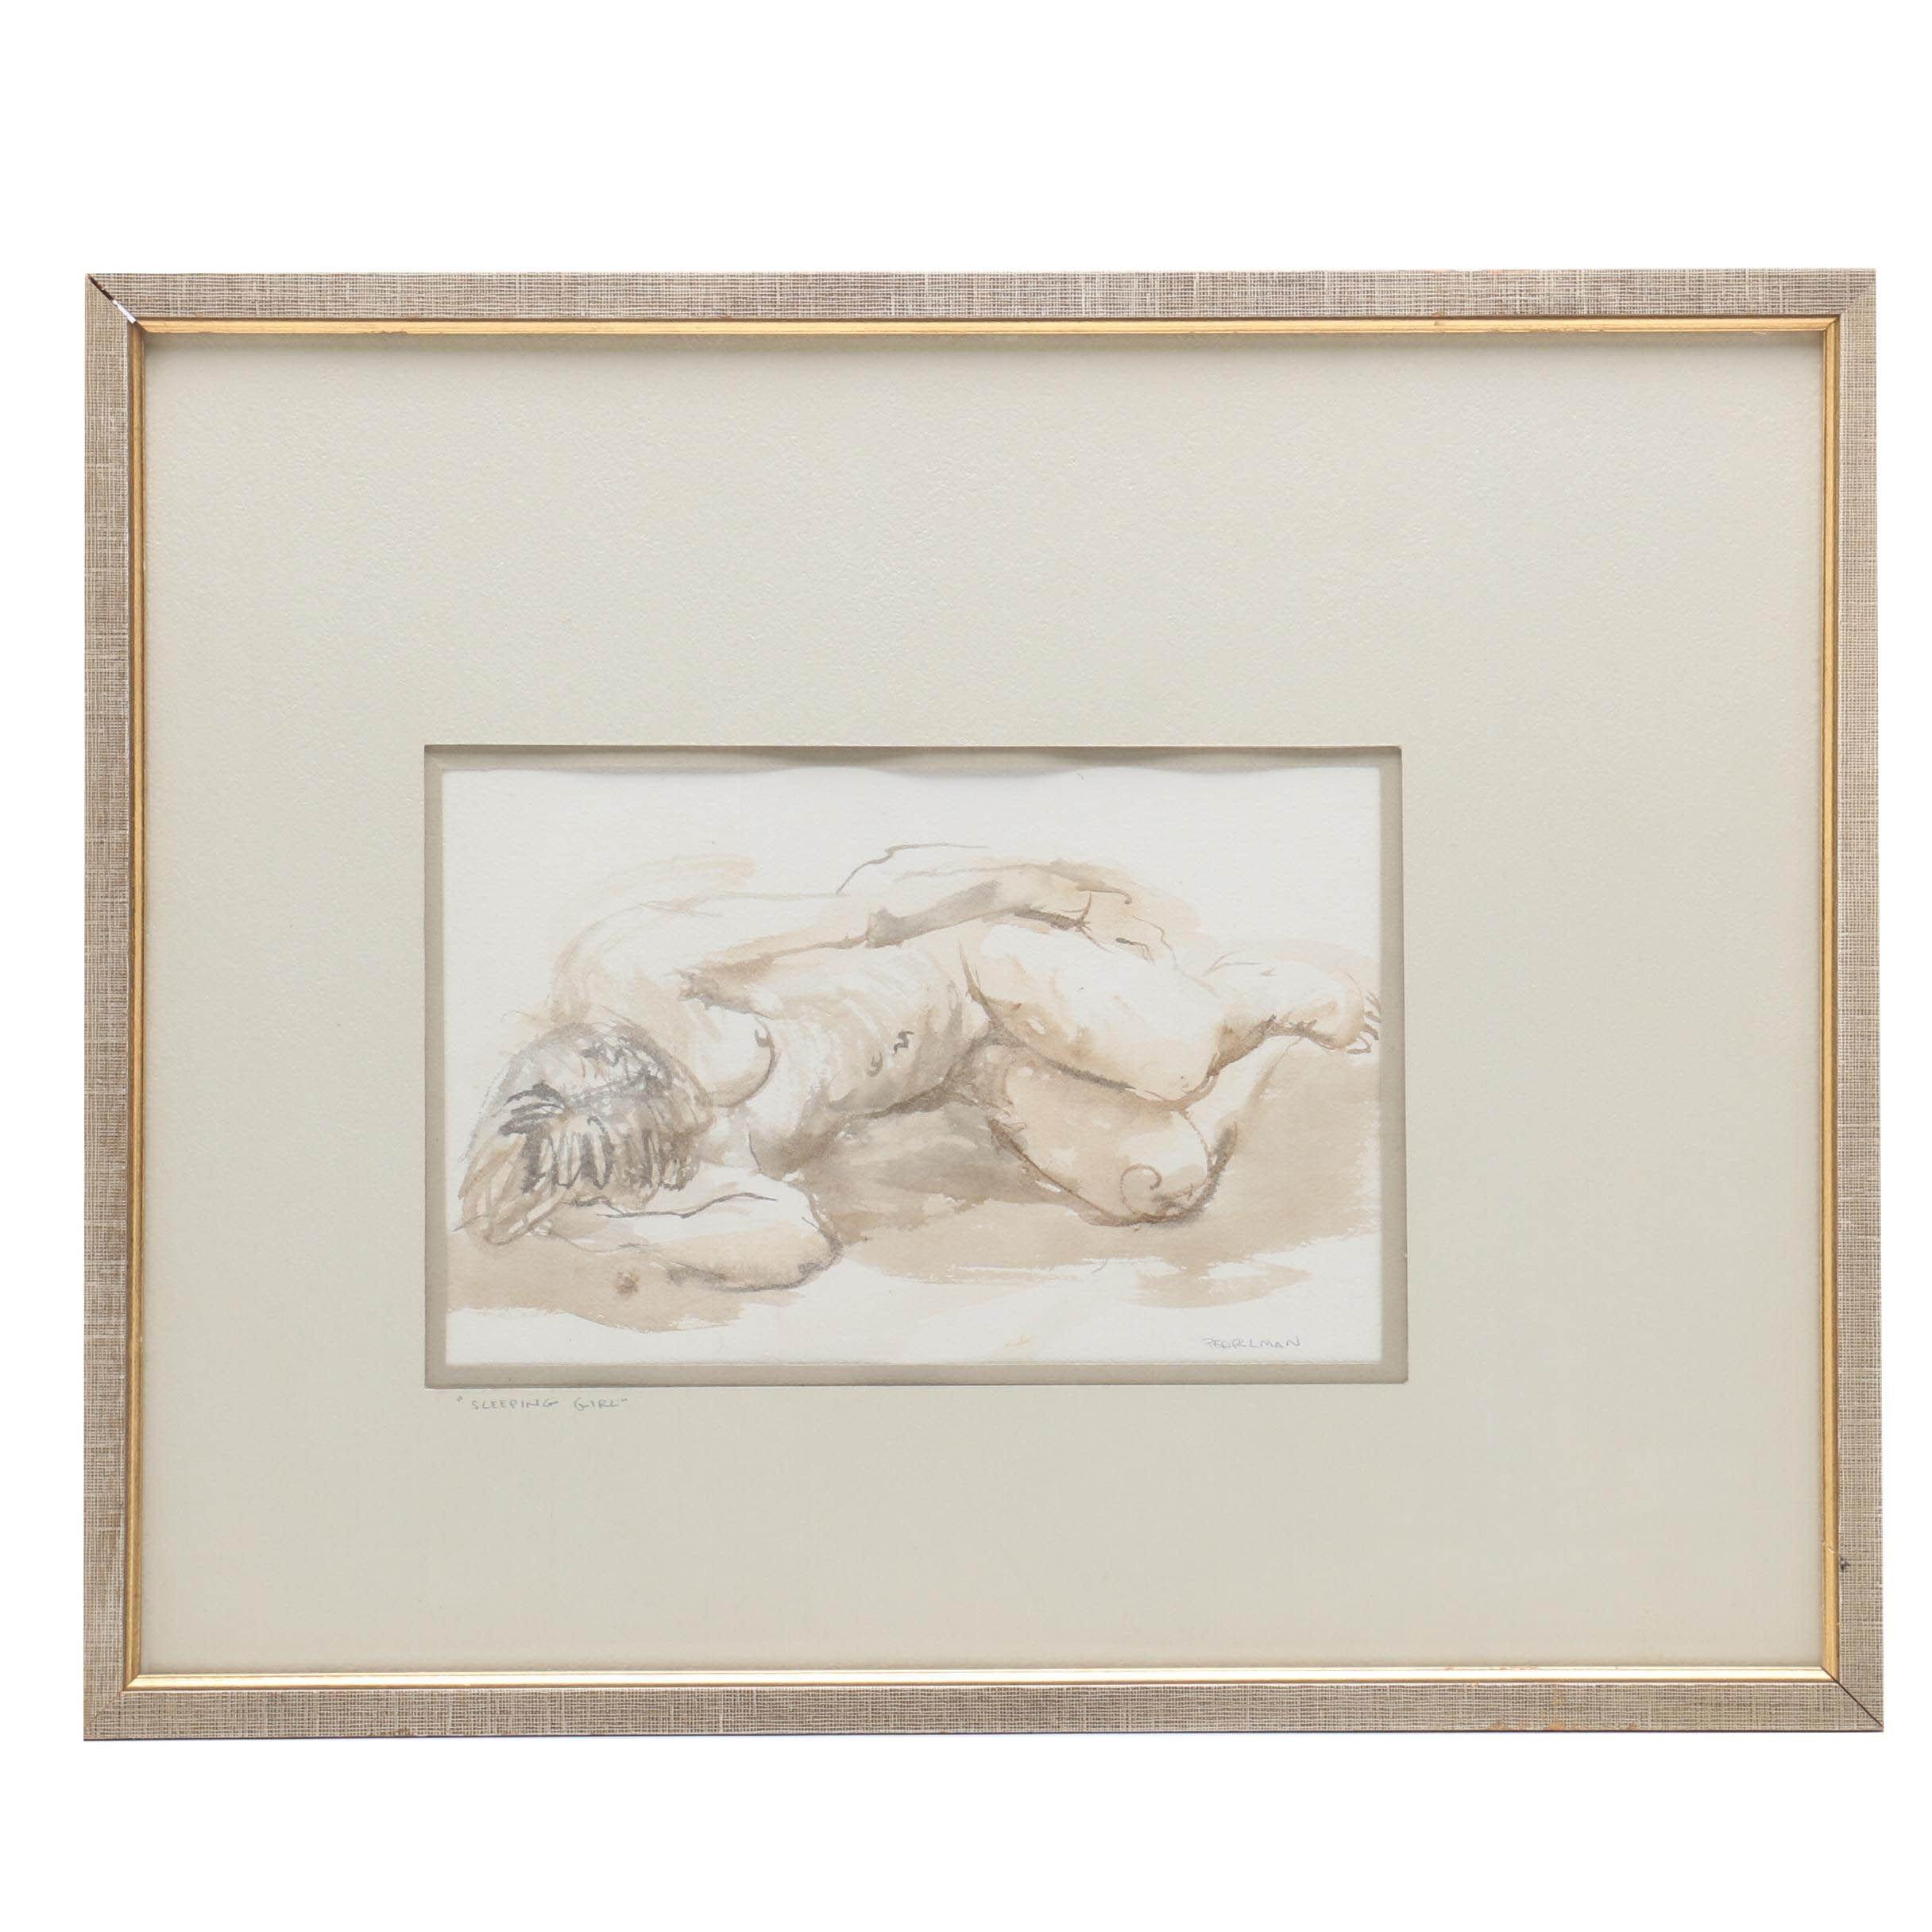 "Ruthe G. Pearlman Watercolor Painting ""Sleeping Girl"""